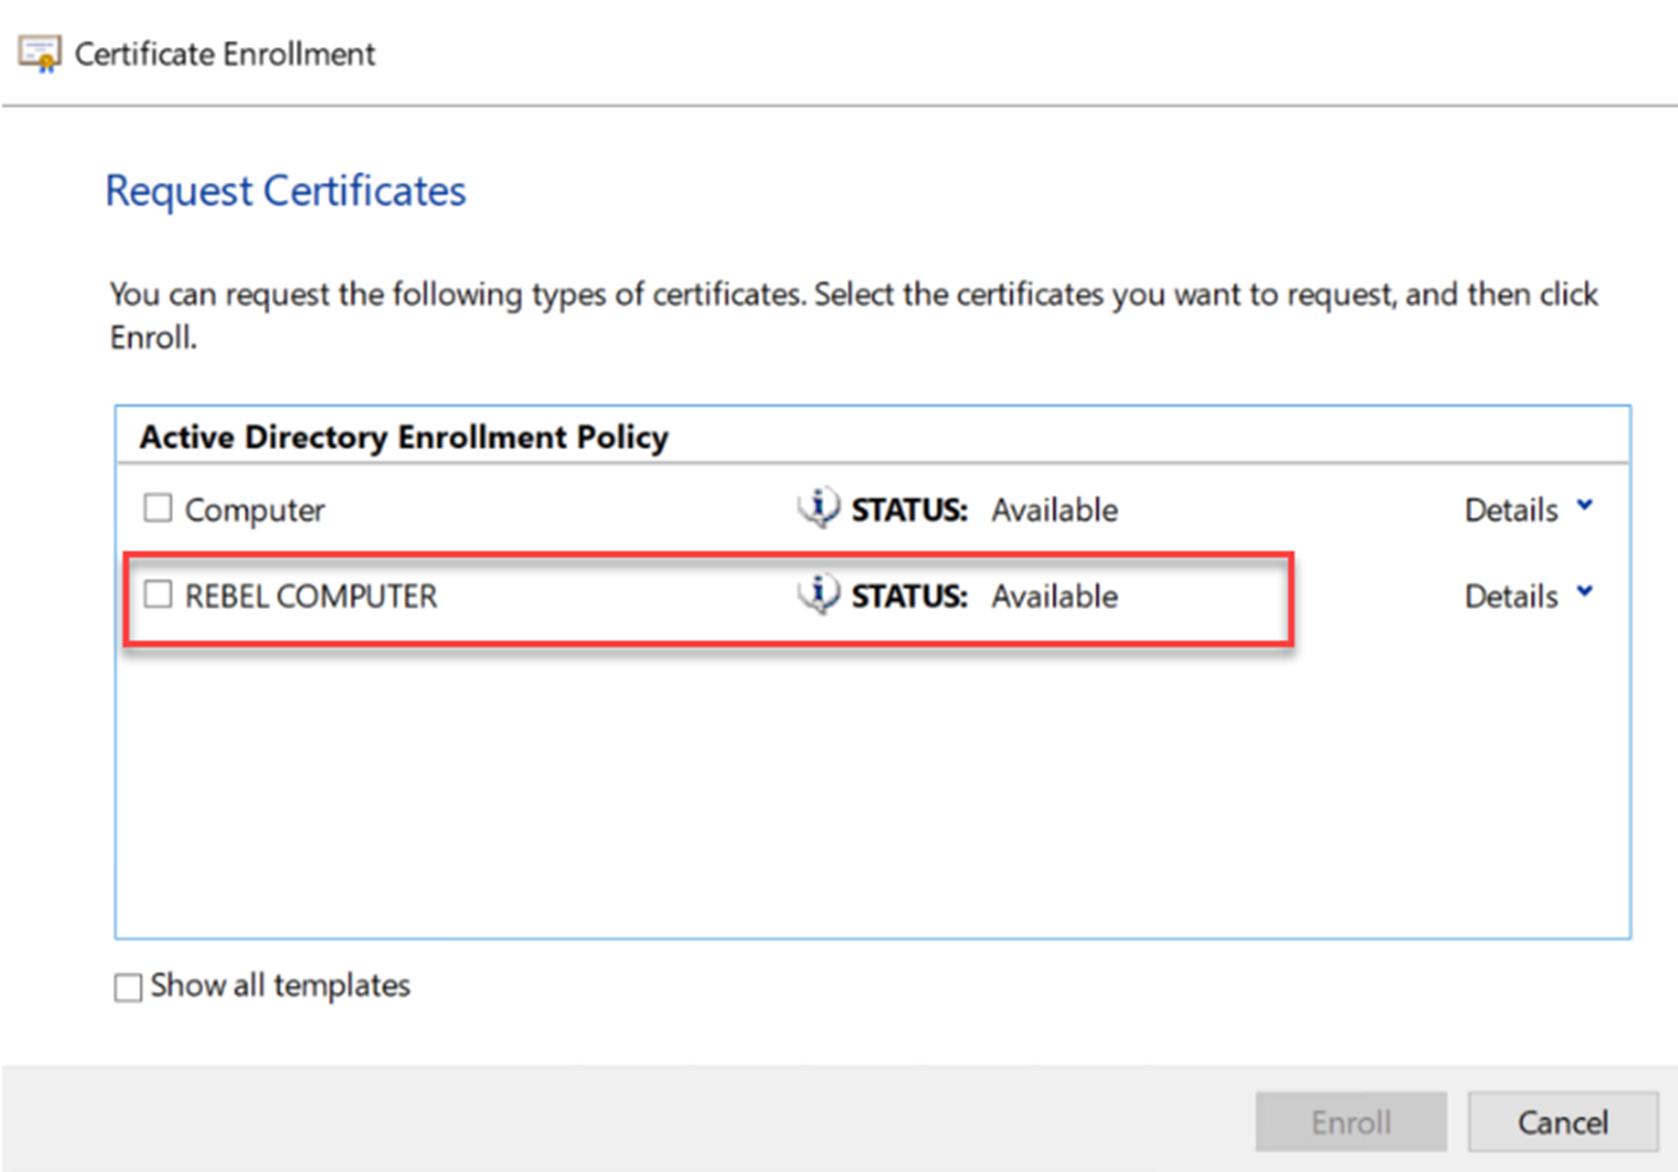 Certificate Template created on Windows Server 2008 R2 CA